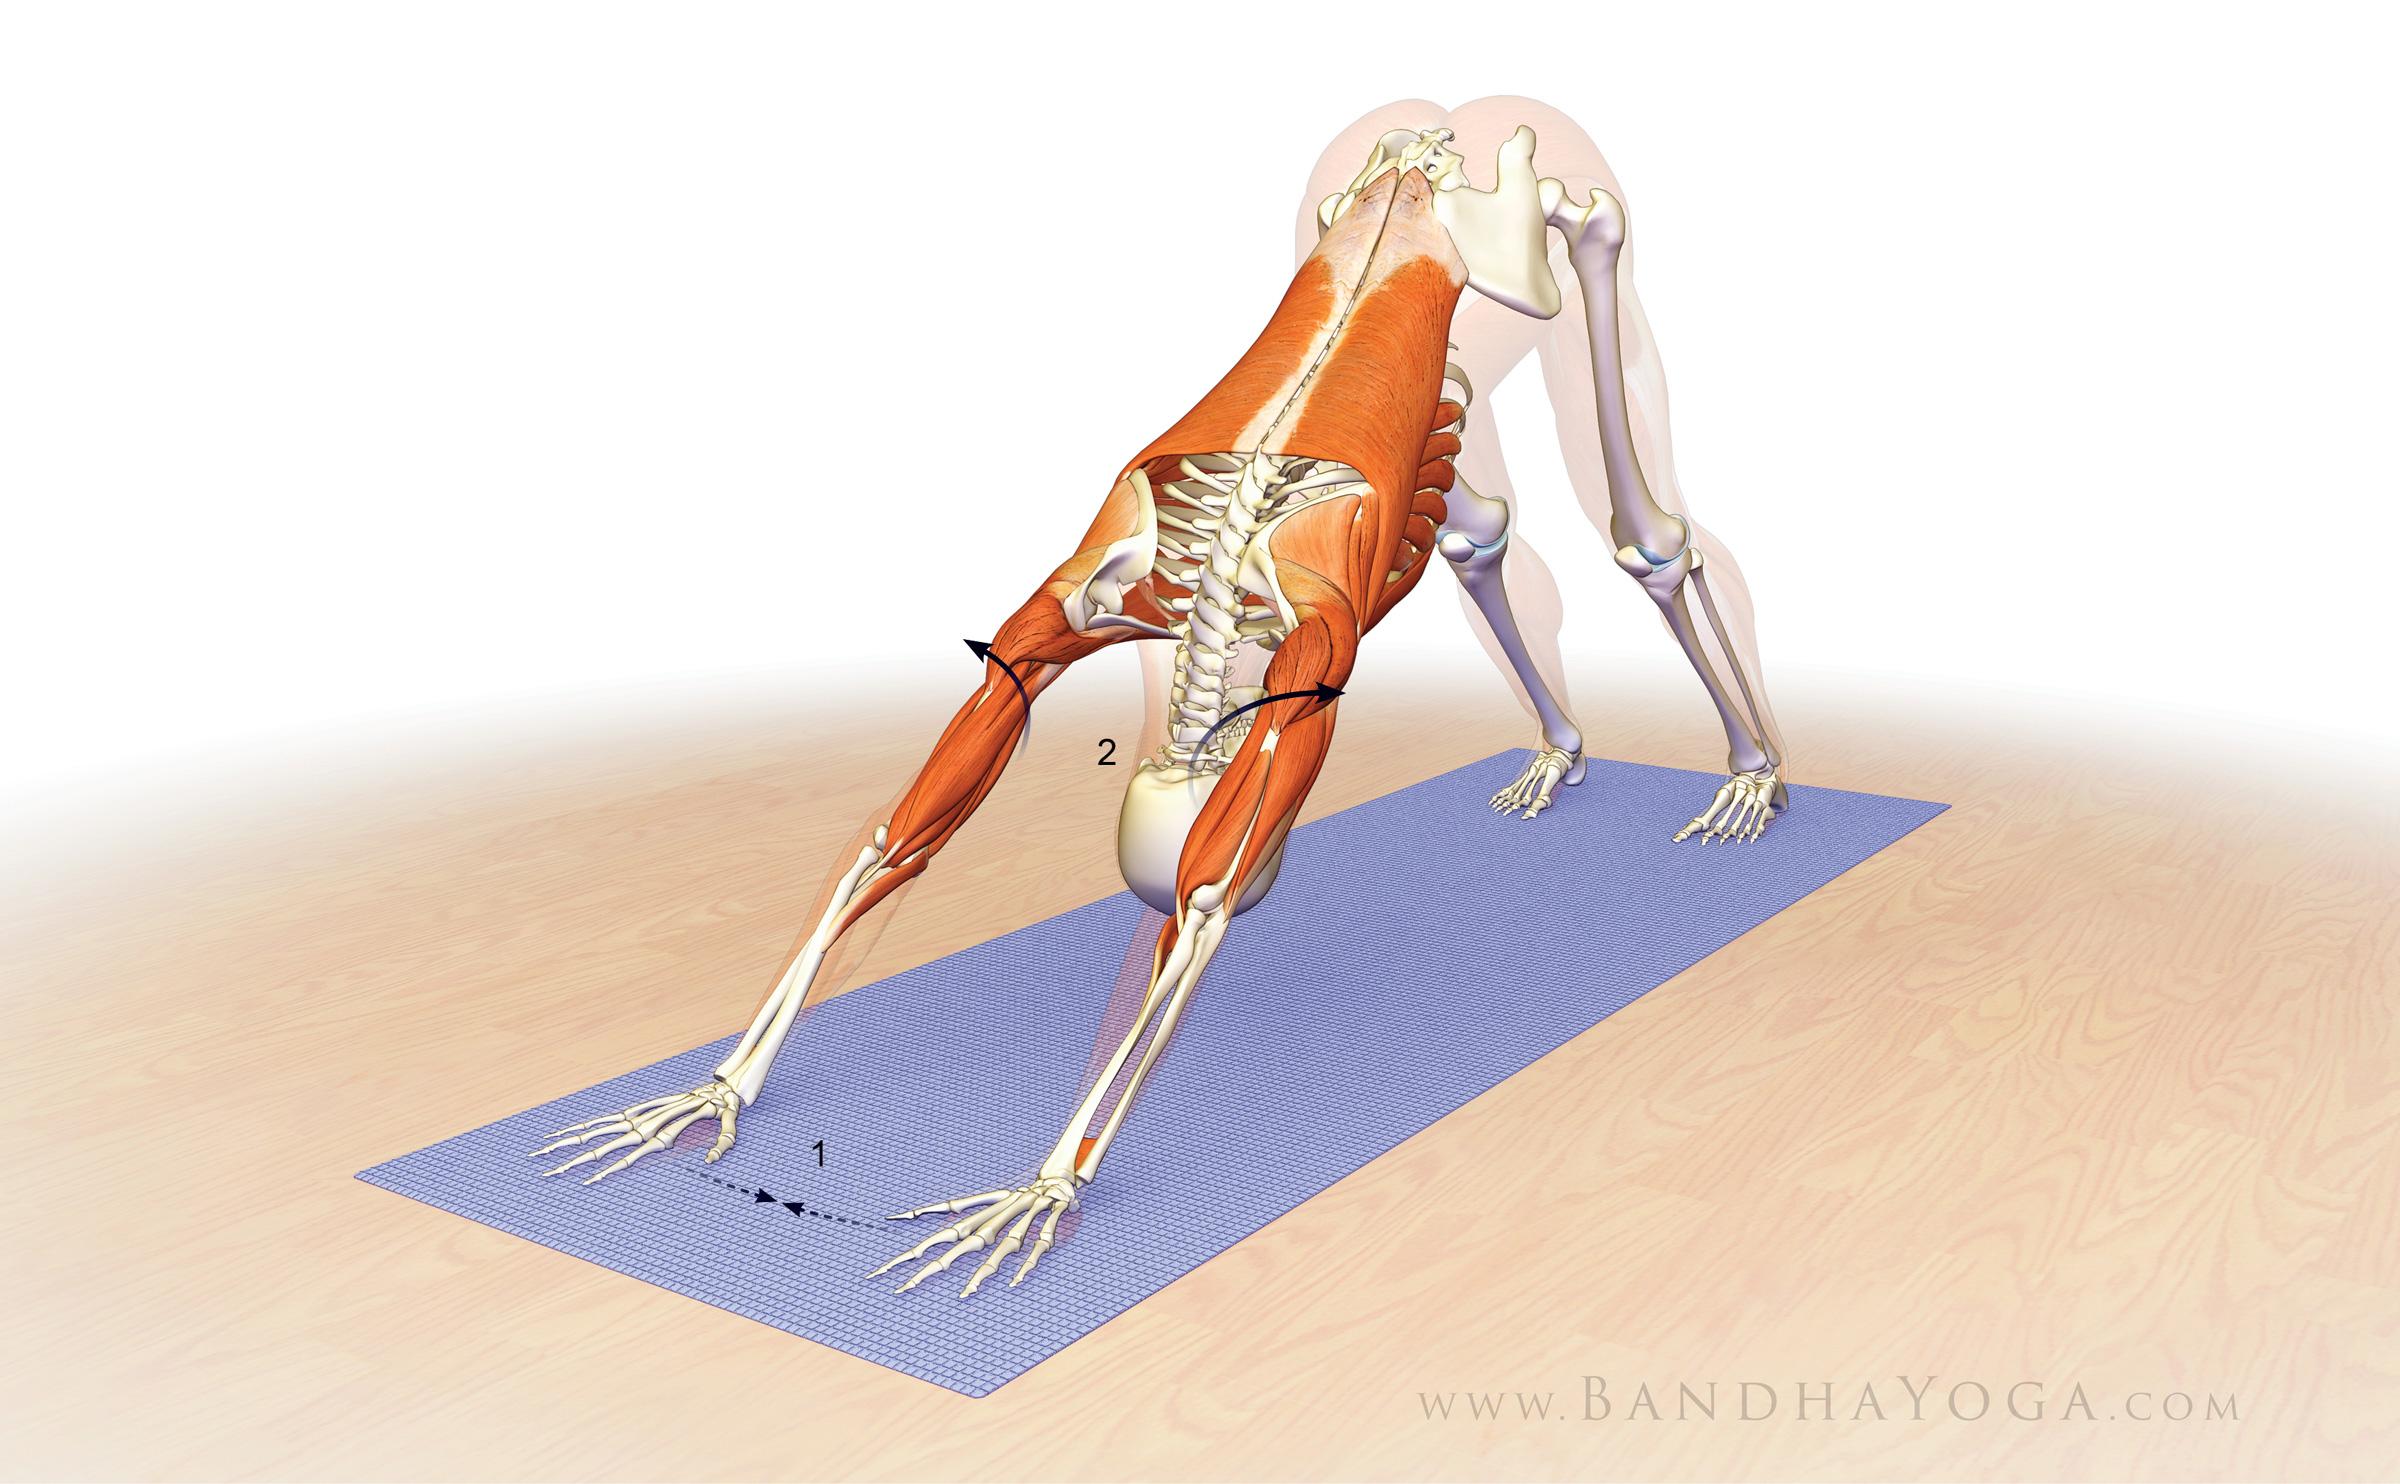 Online Yoga Teacher Ed Dr. Ray Long on Stabilizing the Shoulder ...